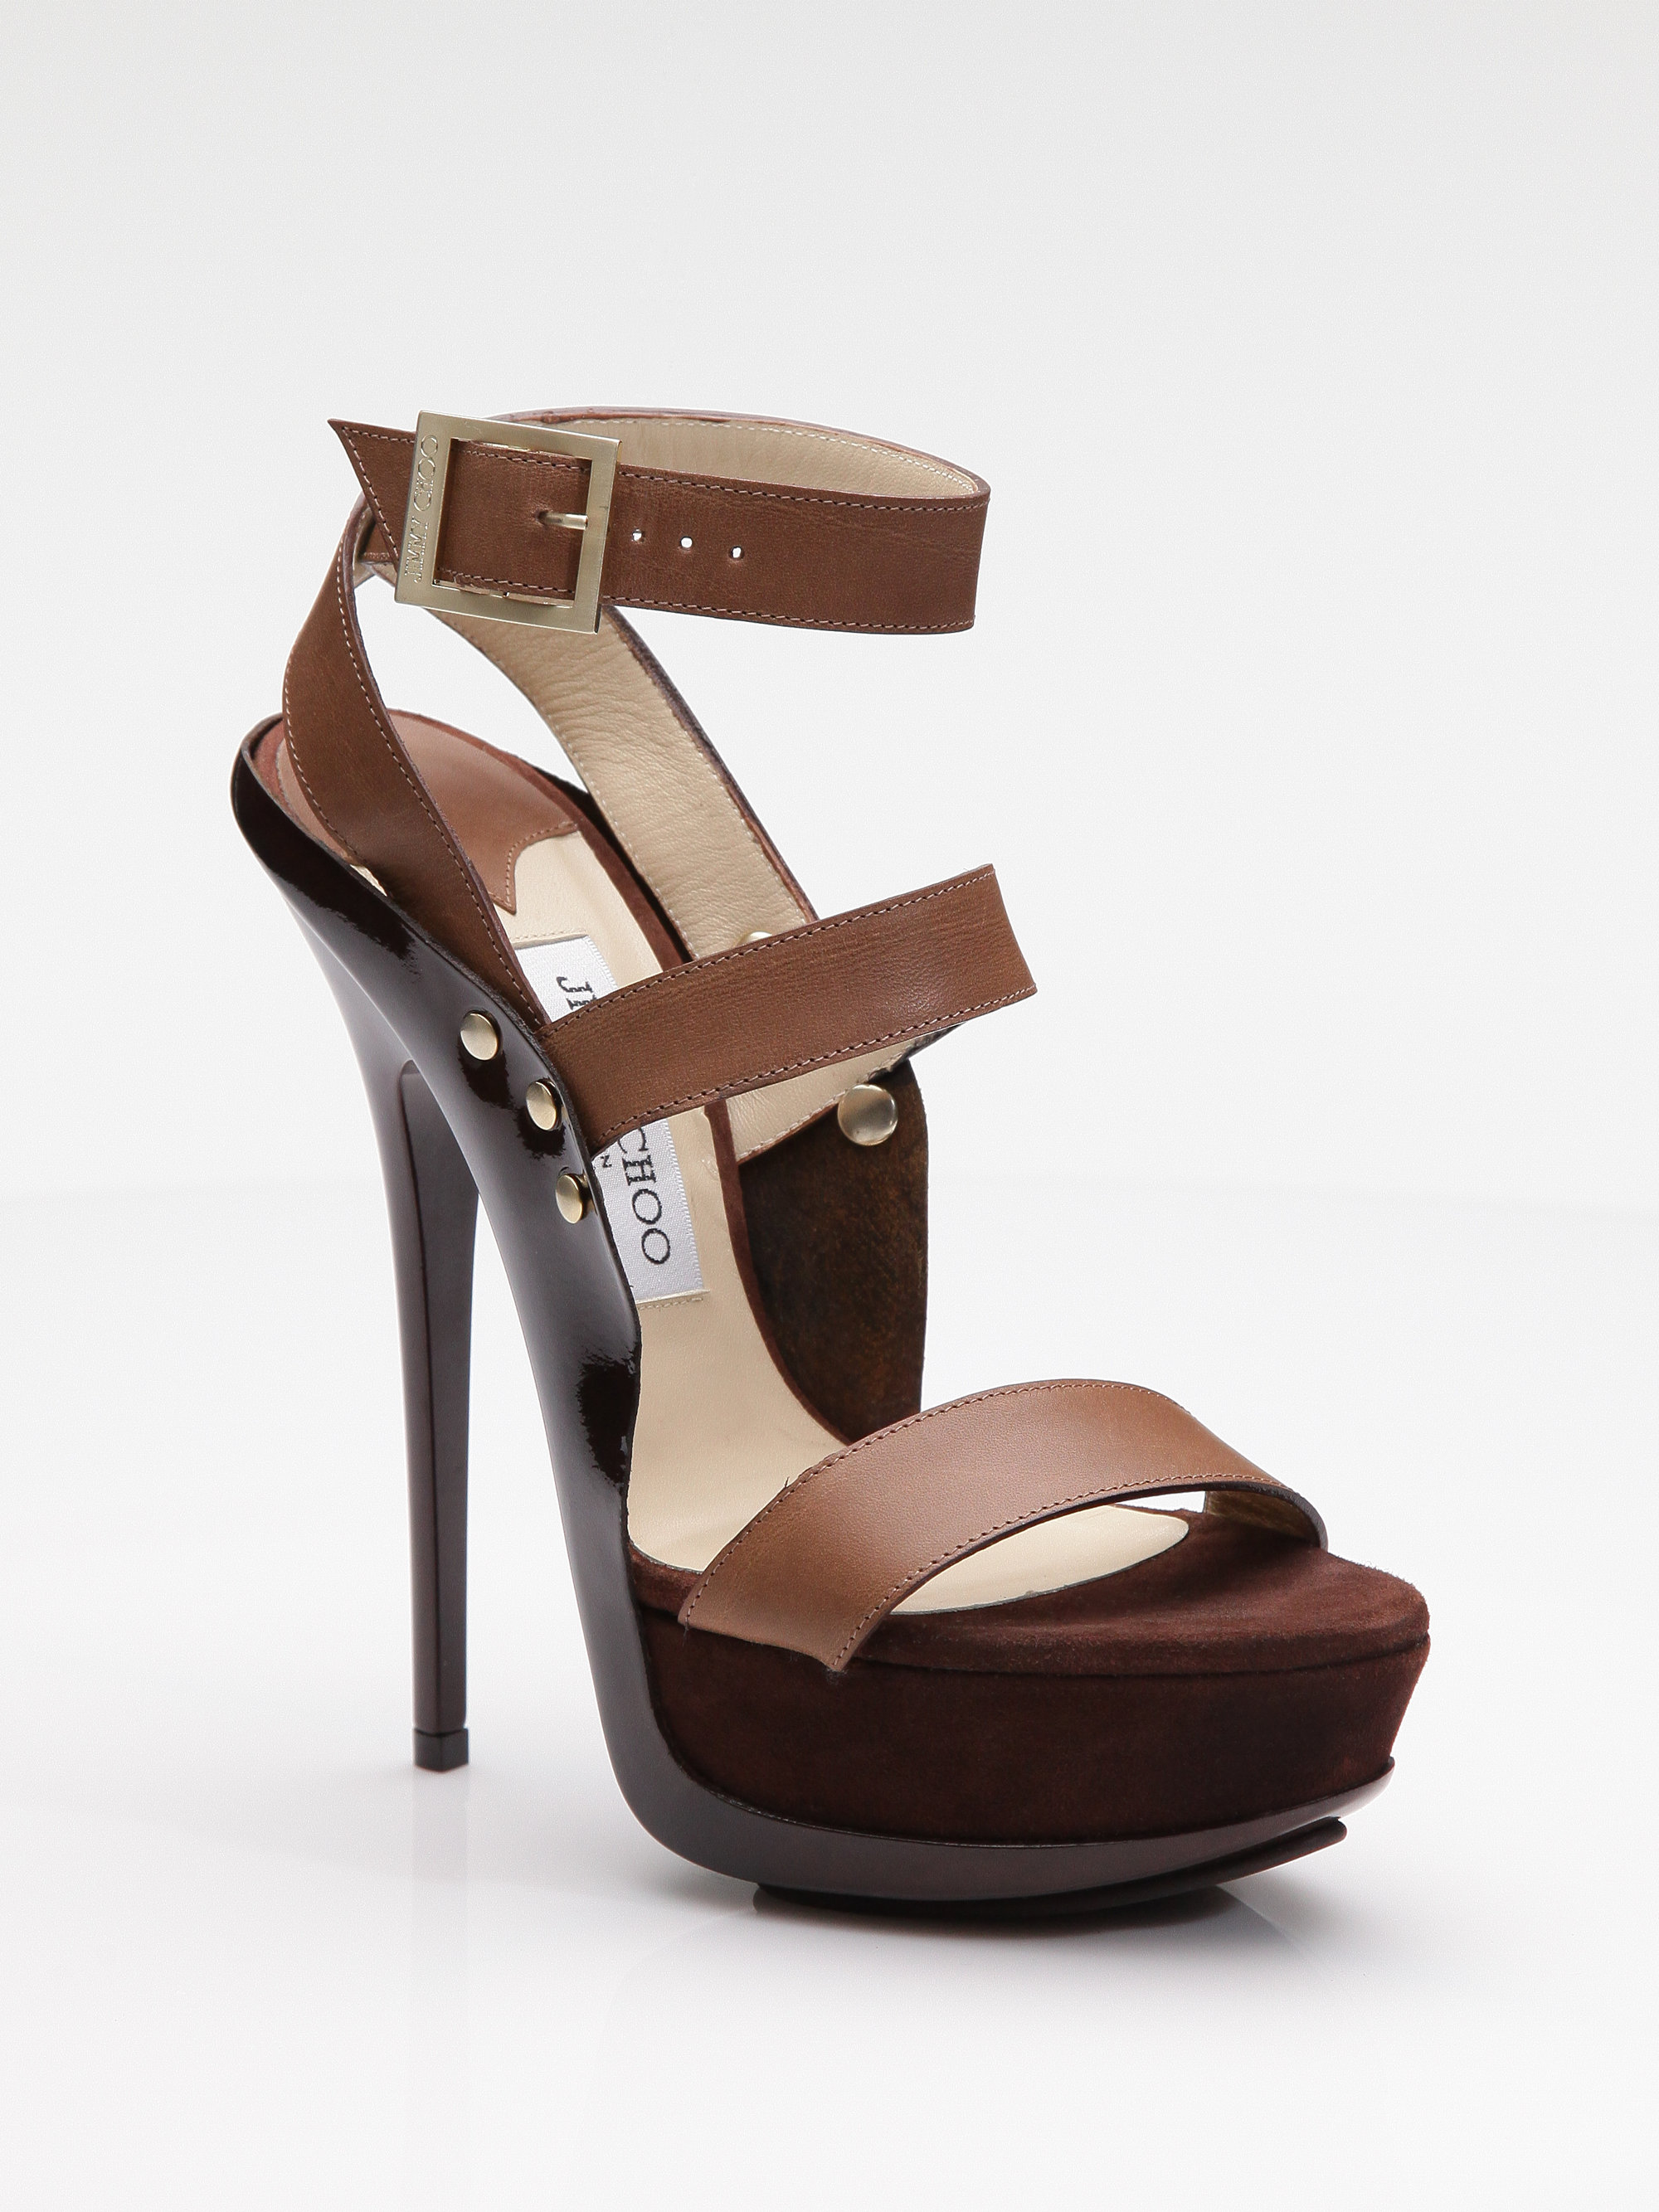 e2d05e02a2b88b Lyst - Jimmy Choo Halley Platform Sandals in Brown